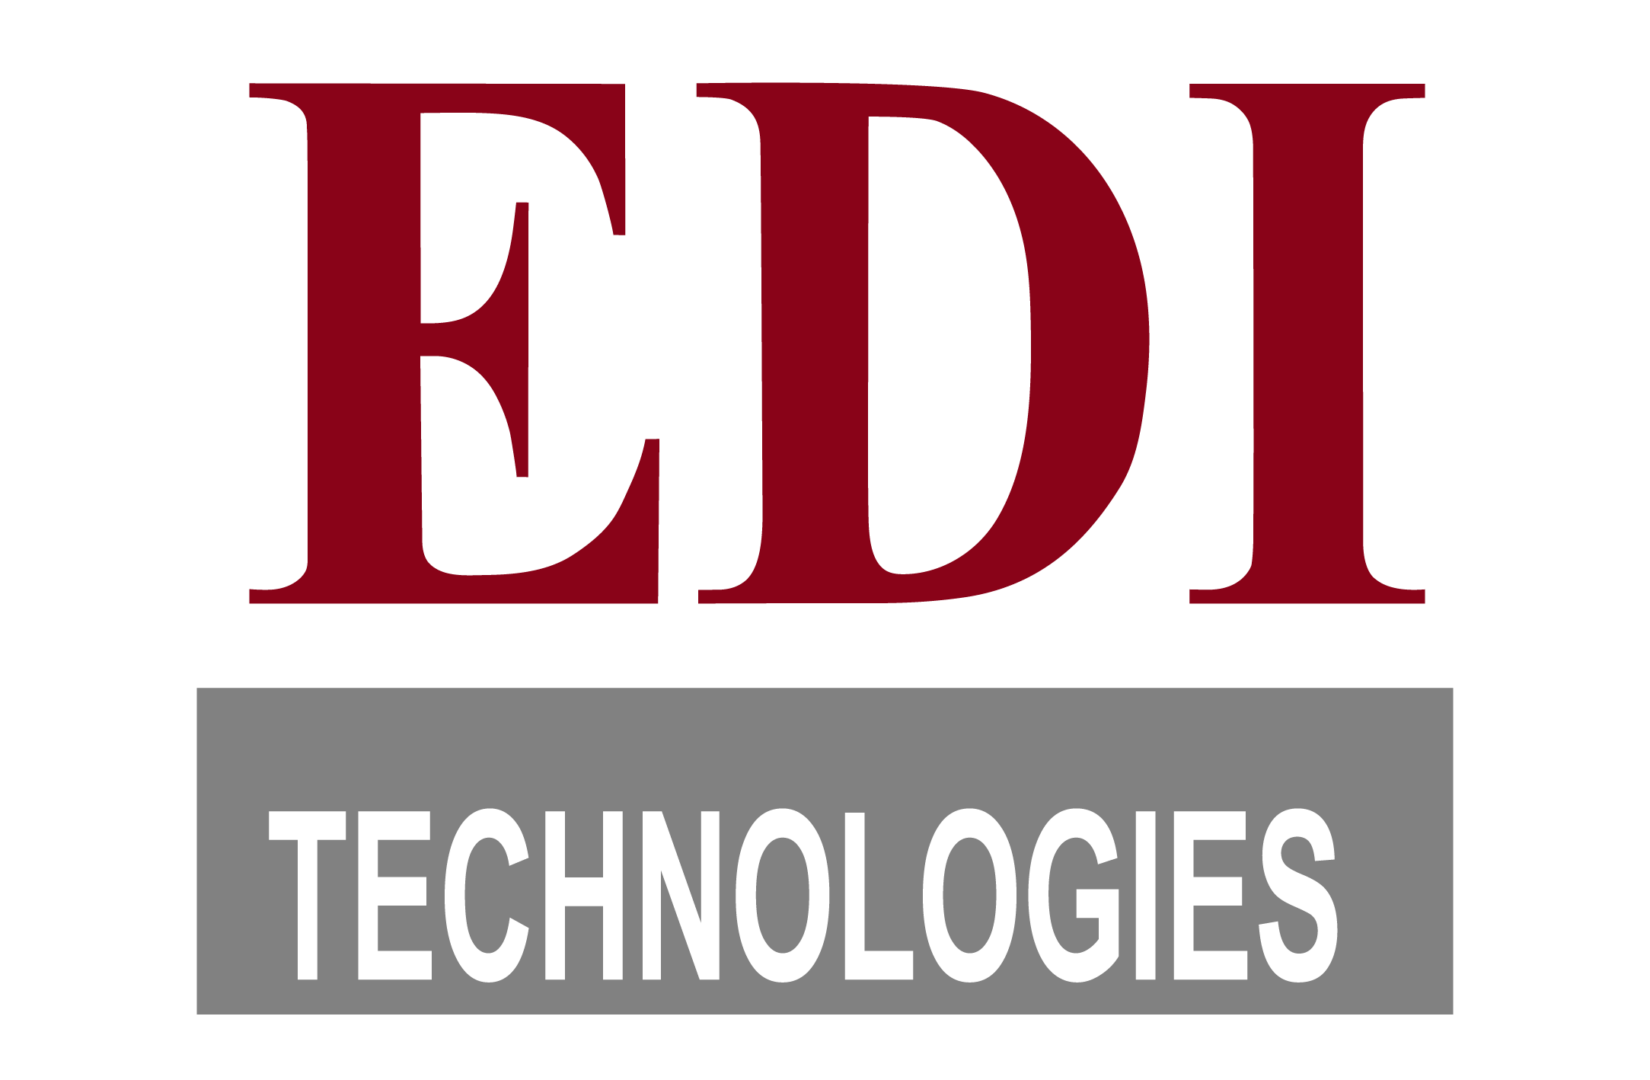 EDI Technologies logo